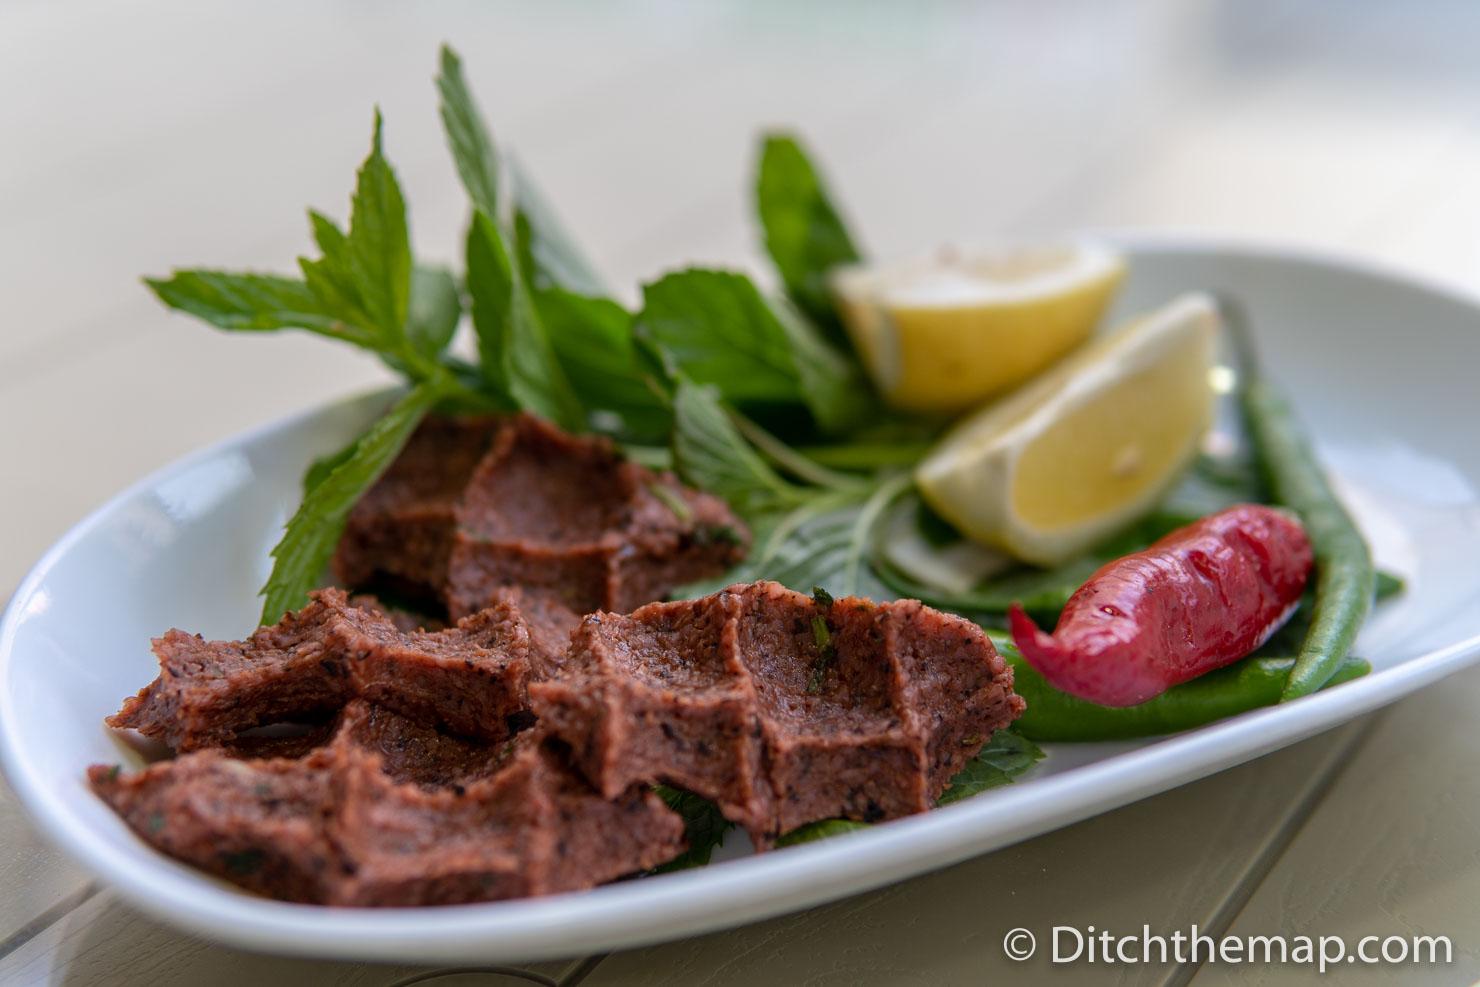 A plate of cig kofte - meat-free, spicy, bulgur meatballs, in Sanliurfa, Turkey